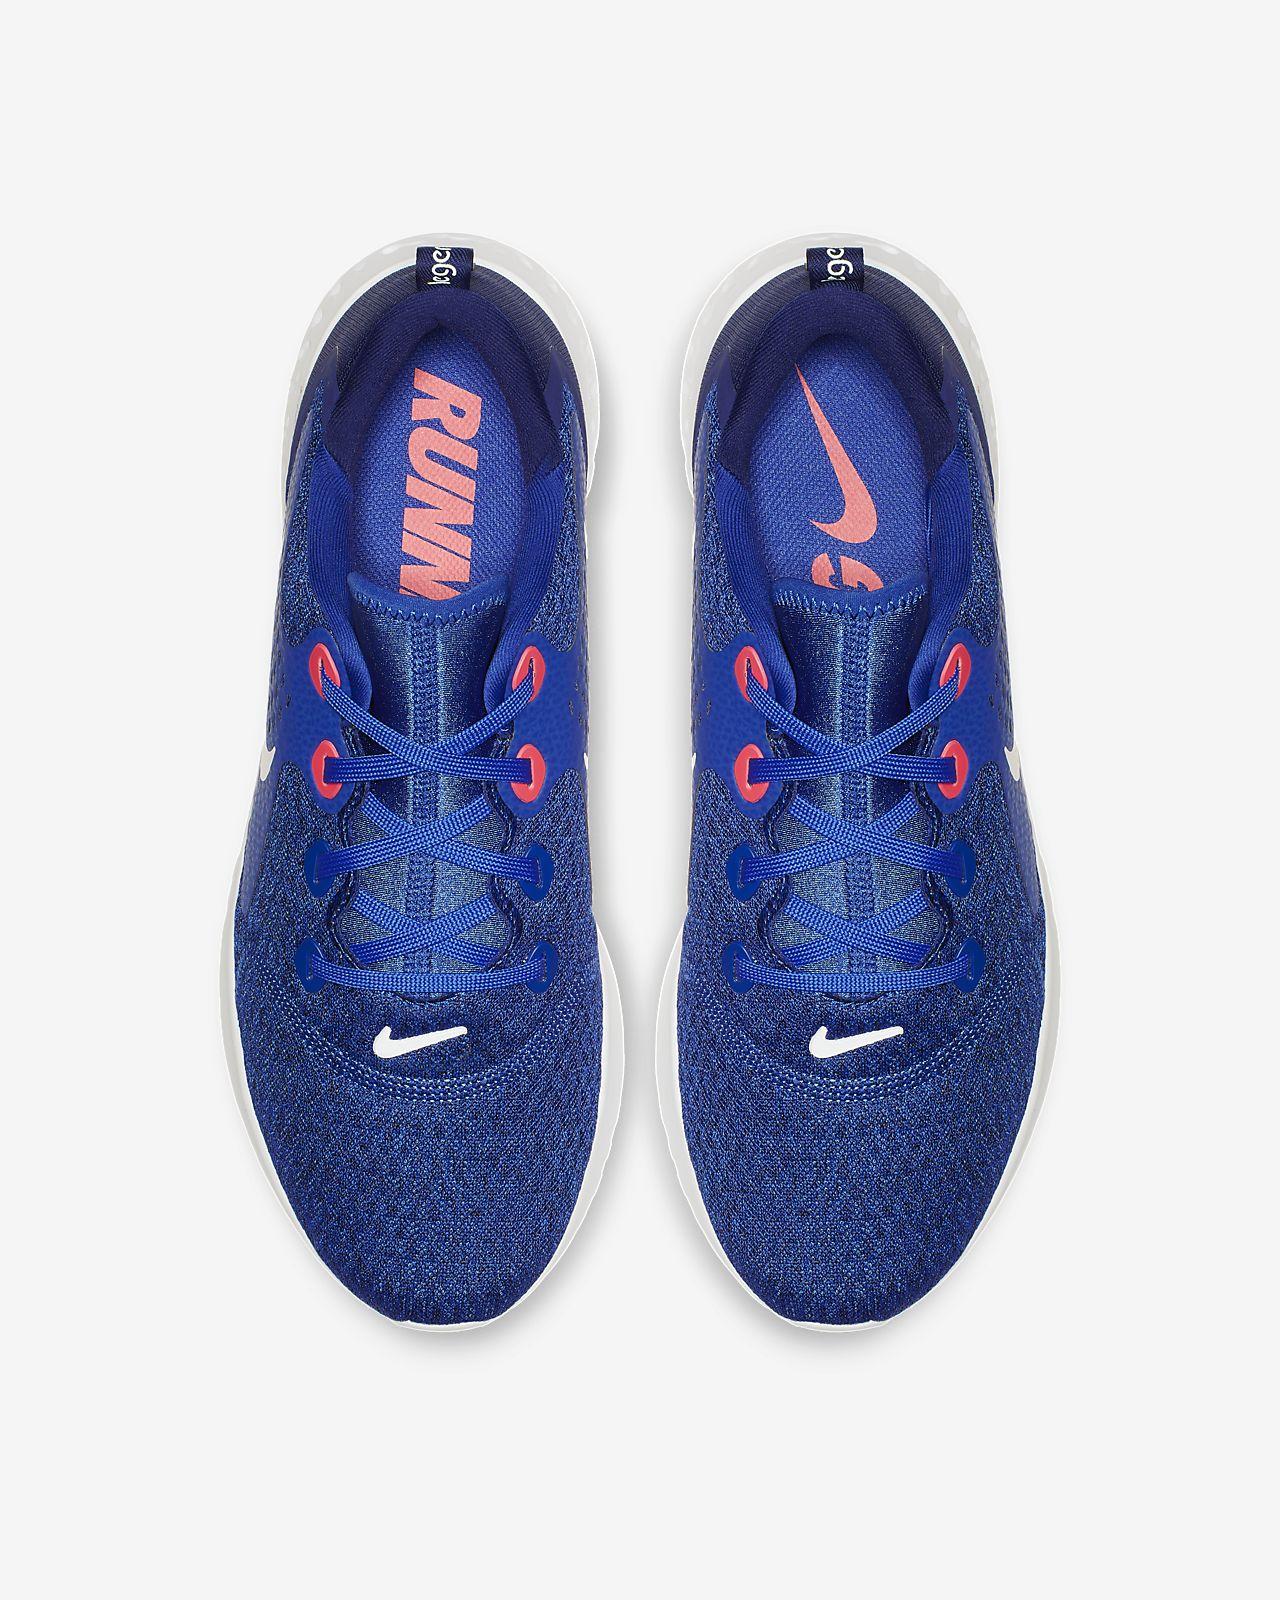 Pour Homme Legend Nike Chaussure Running De React 0Oy8vmnwNP